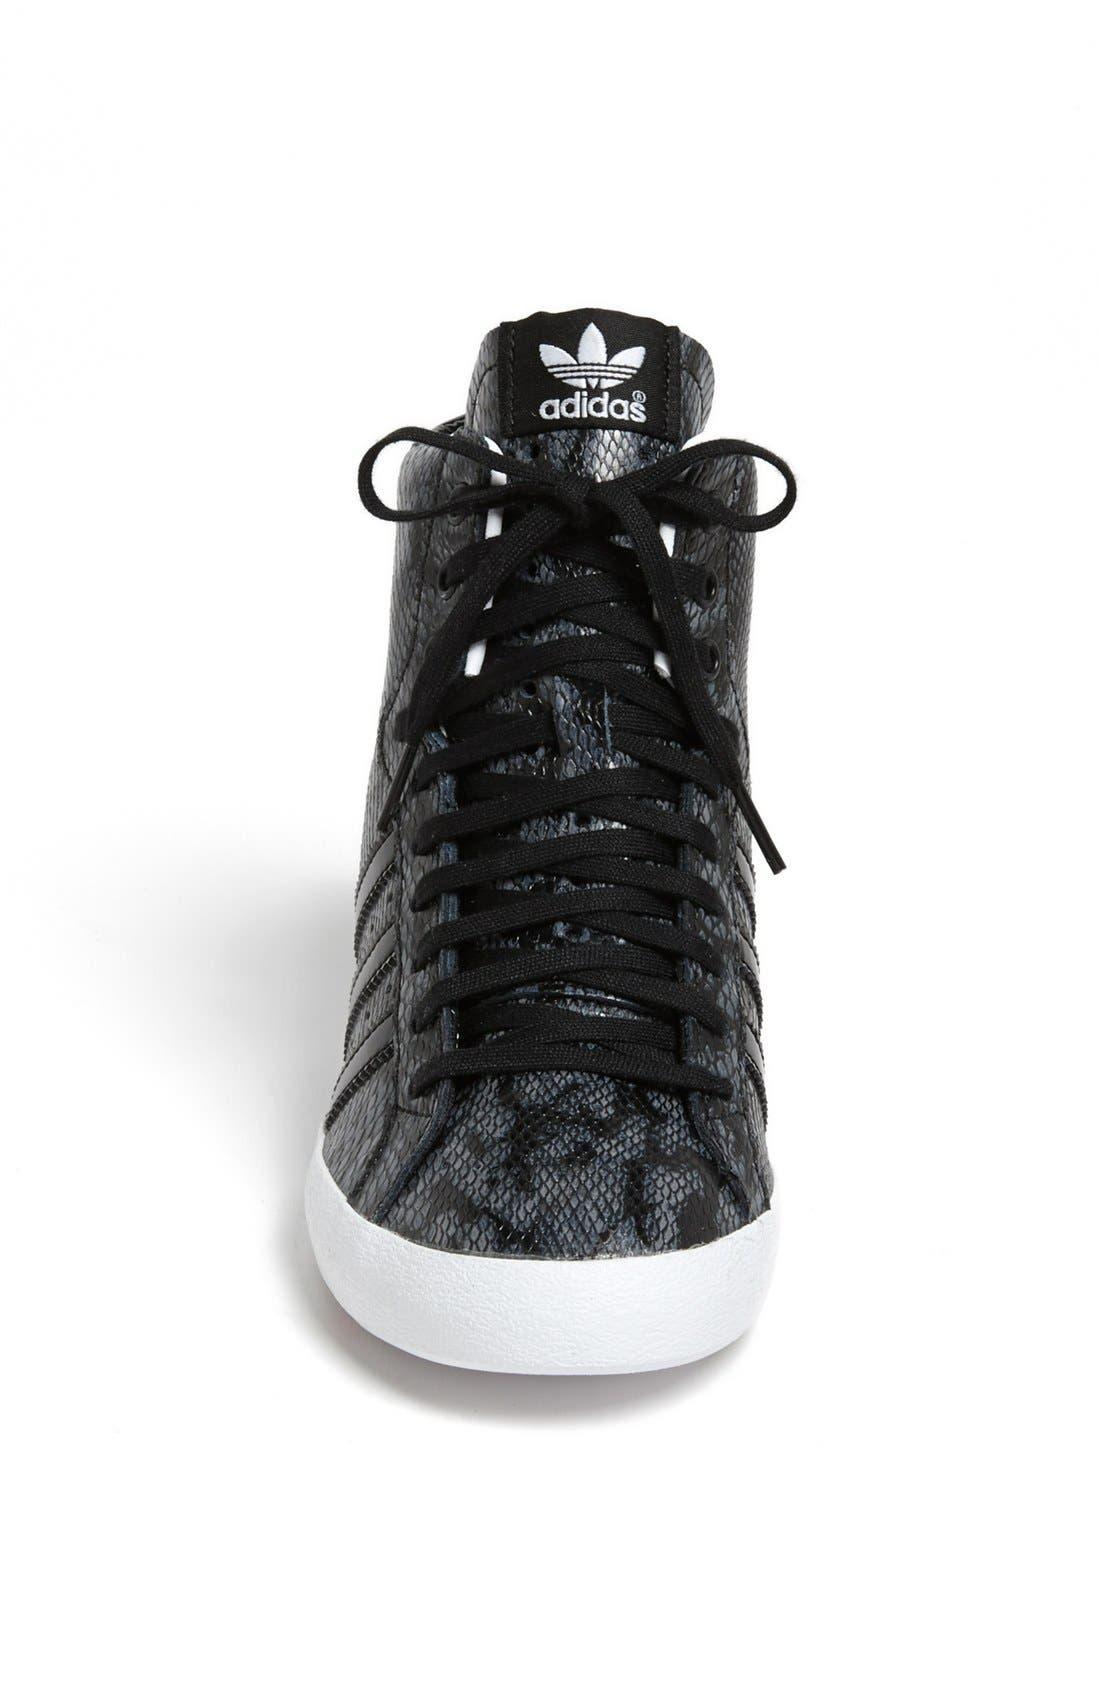 ADIDAS, 'Basket Profi' Hidden Wedge Sneaker, Alternate thumbnail 2, color, 001